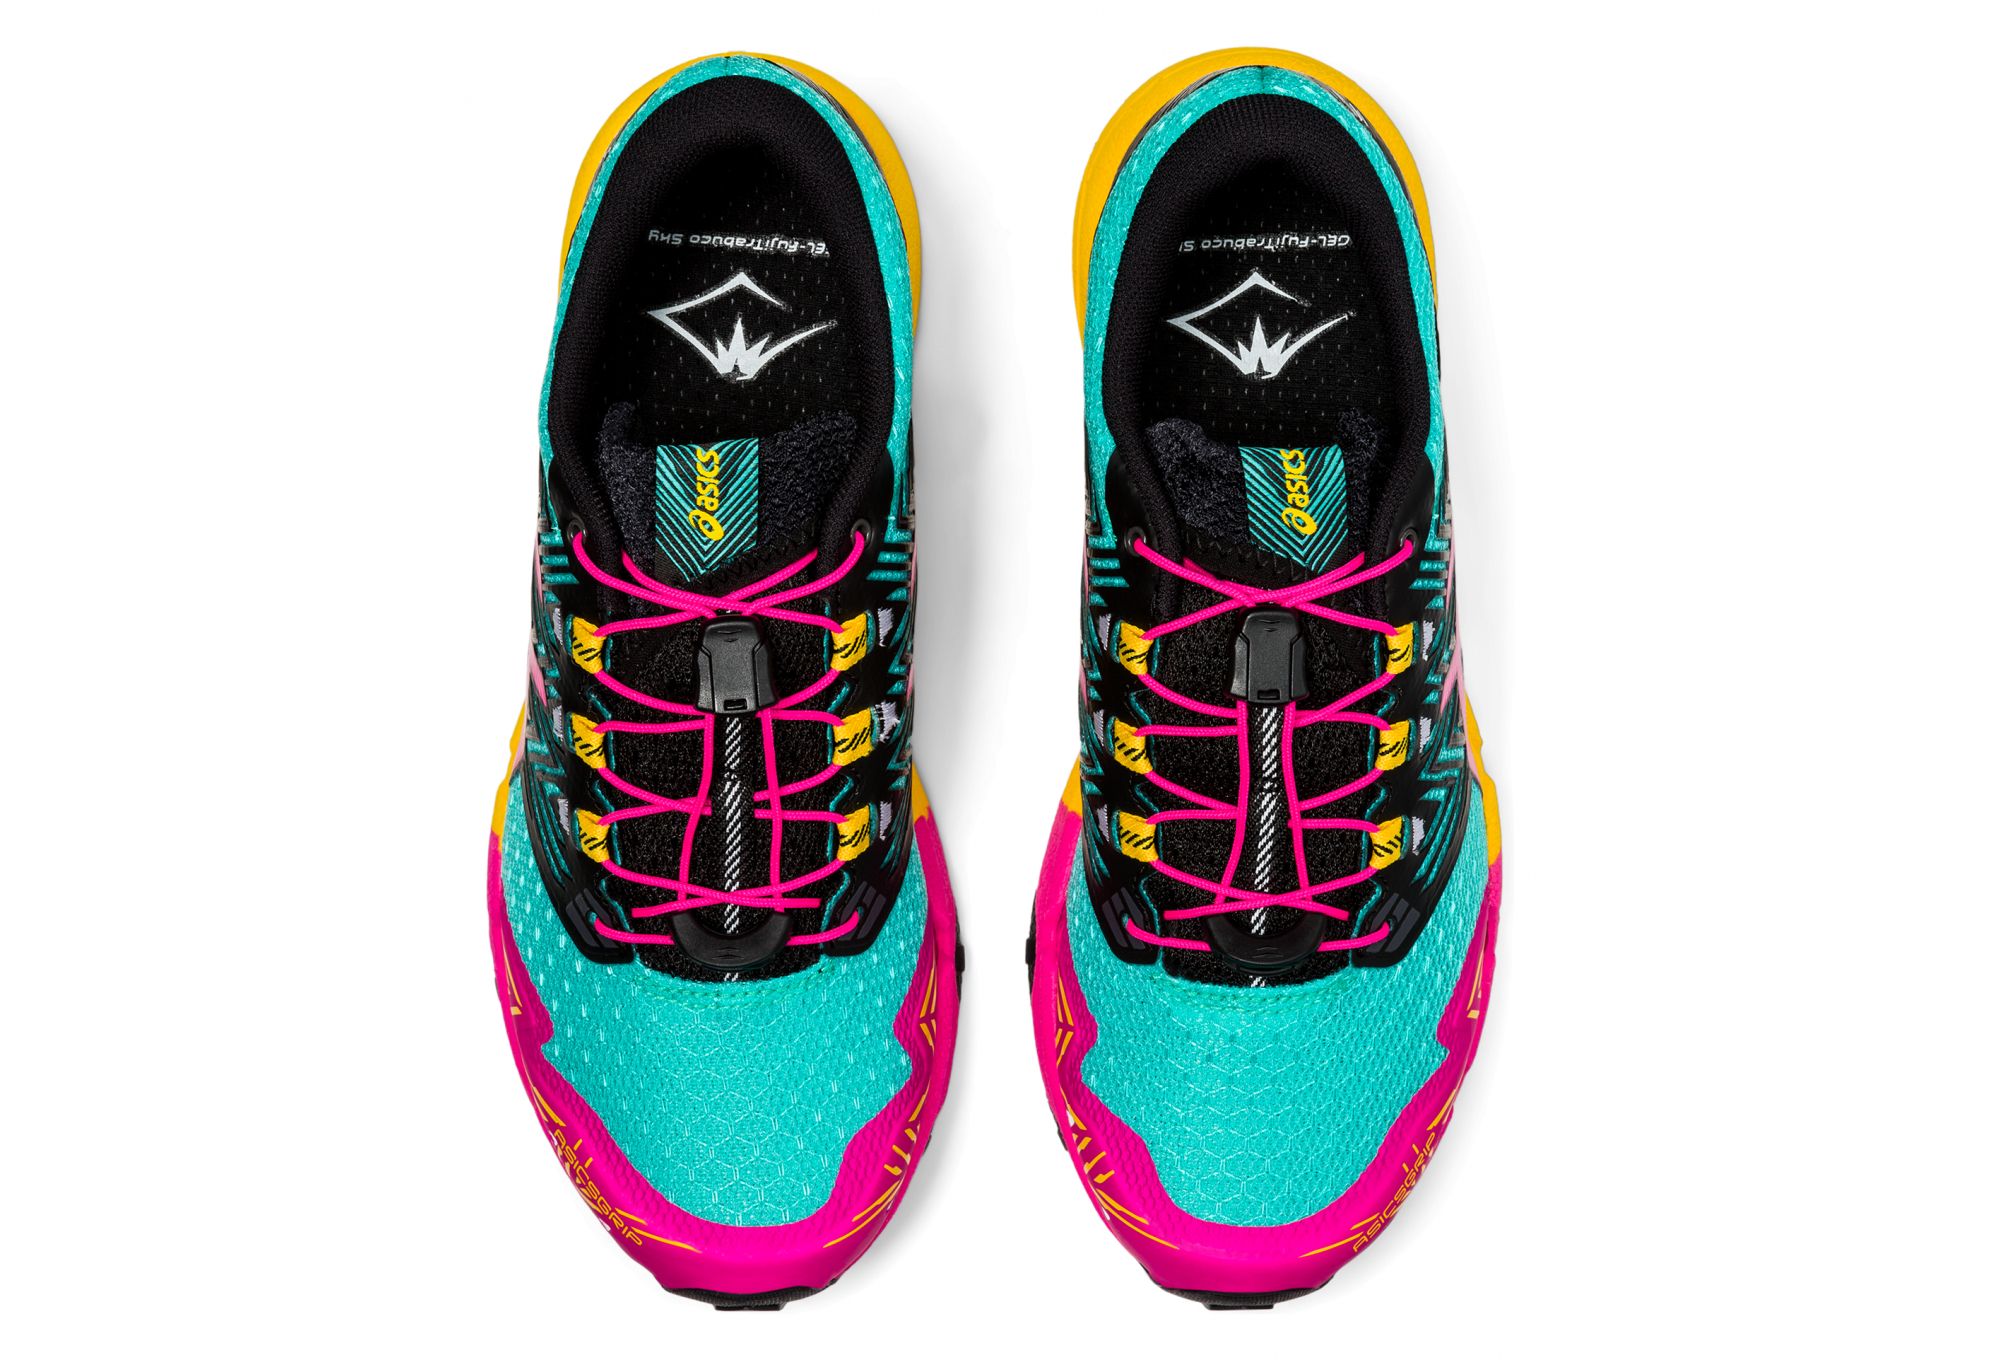 Chaussures de Trail Femme Asics FujiTrabuco Sky Multi-couleur ...